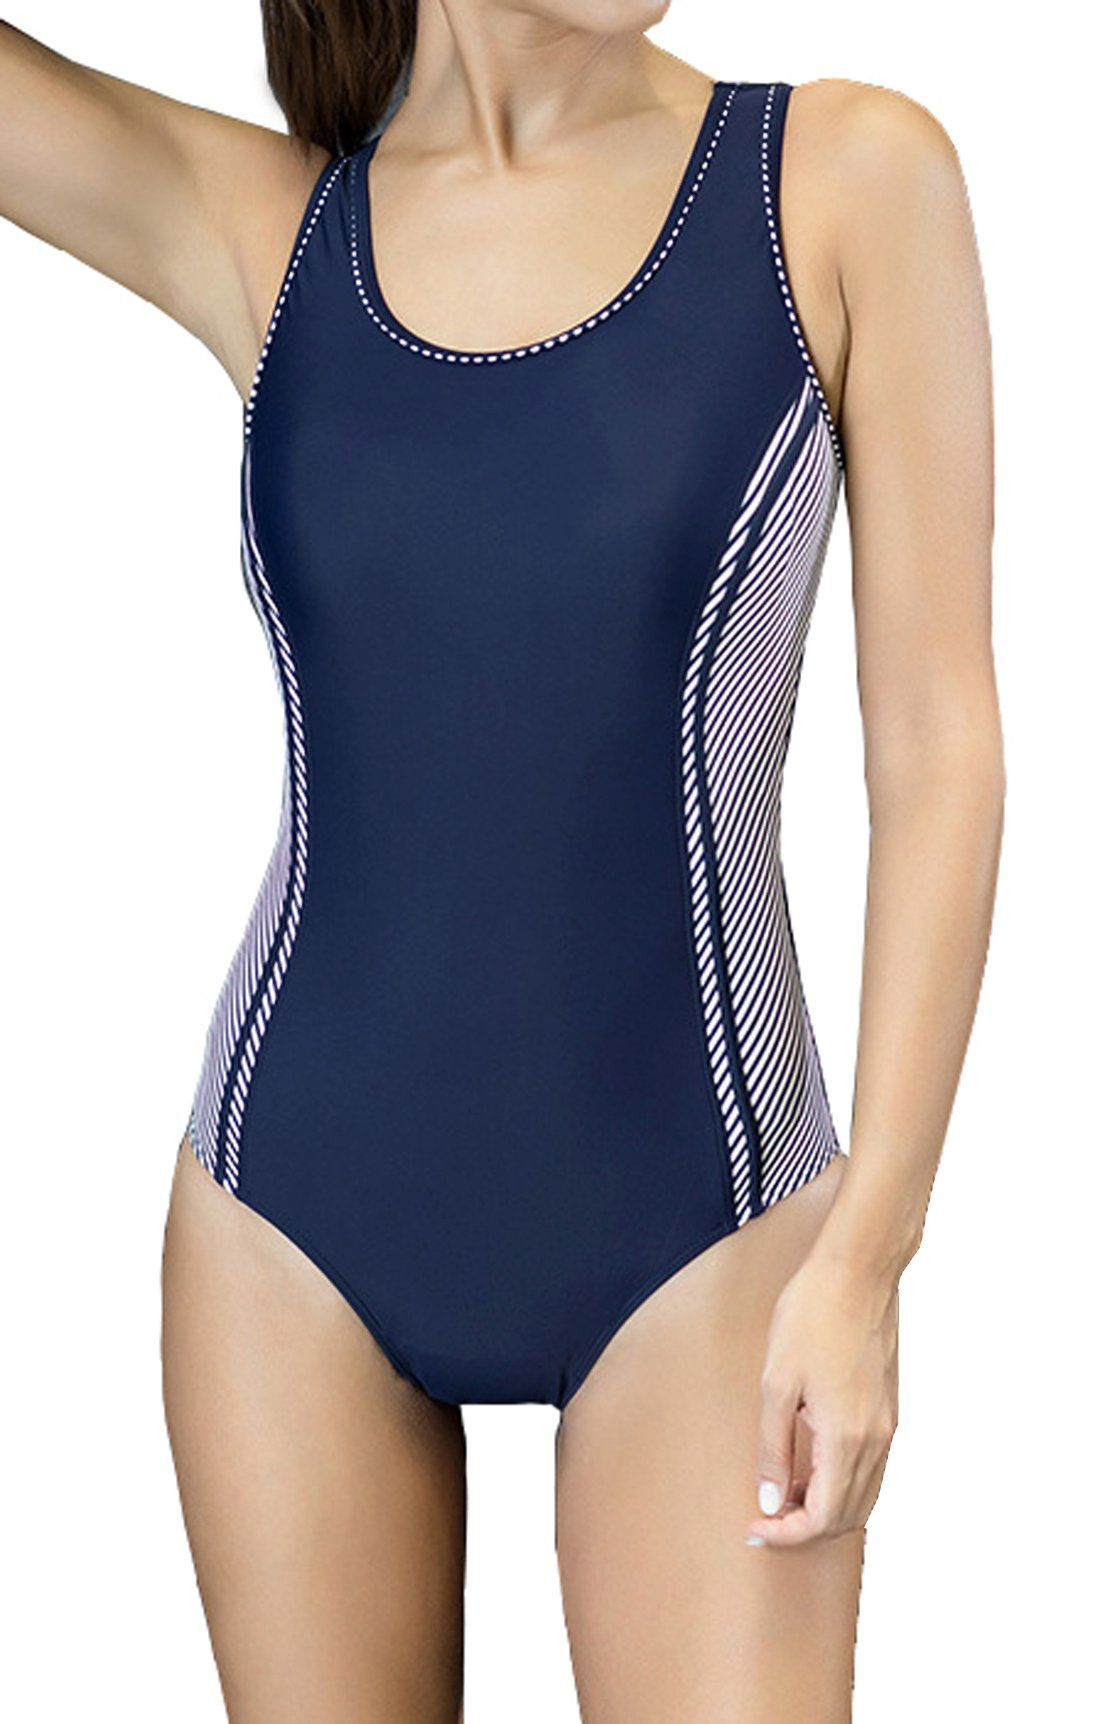 49222e6245a Upopby Women s Tummy Control Monokini One Piece Swimsuit Bathing Suit  Swimwear Navy Blue US8. Normal